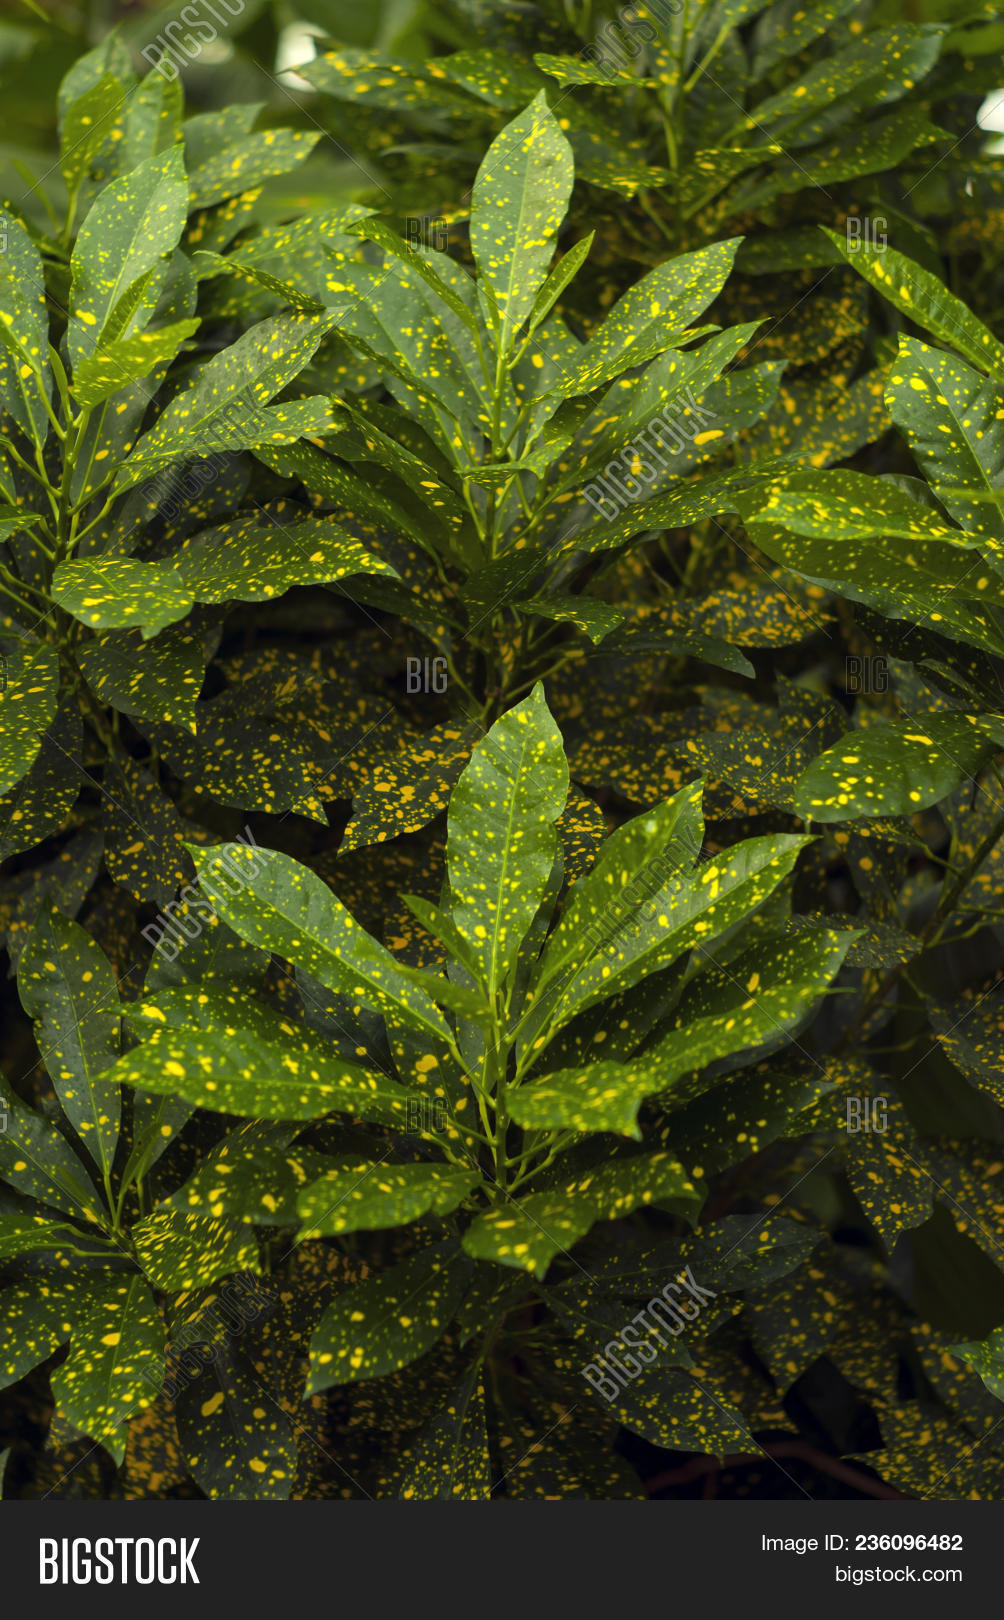 🔥 Floral Background - Green In Gold Speckls Leaves Of Gold ... on 8 leaf house plant, 3 leaf outdoor plant, 5 leaf house plant, 3 leaf plant identification,